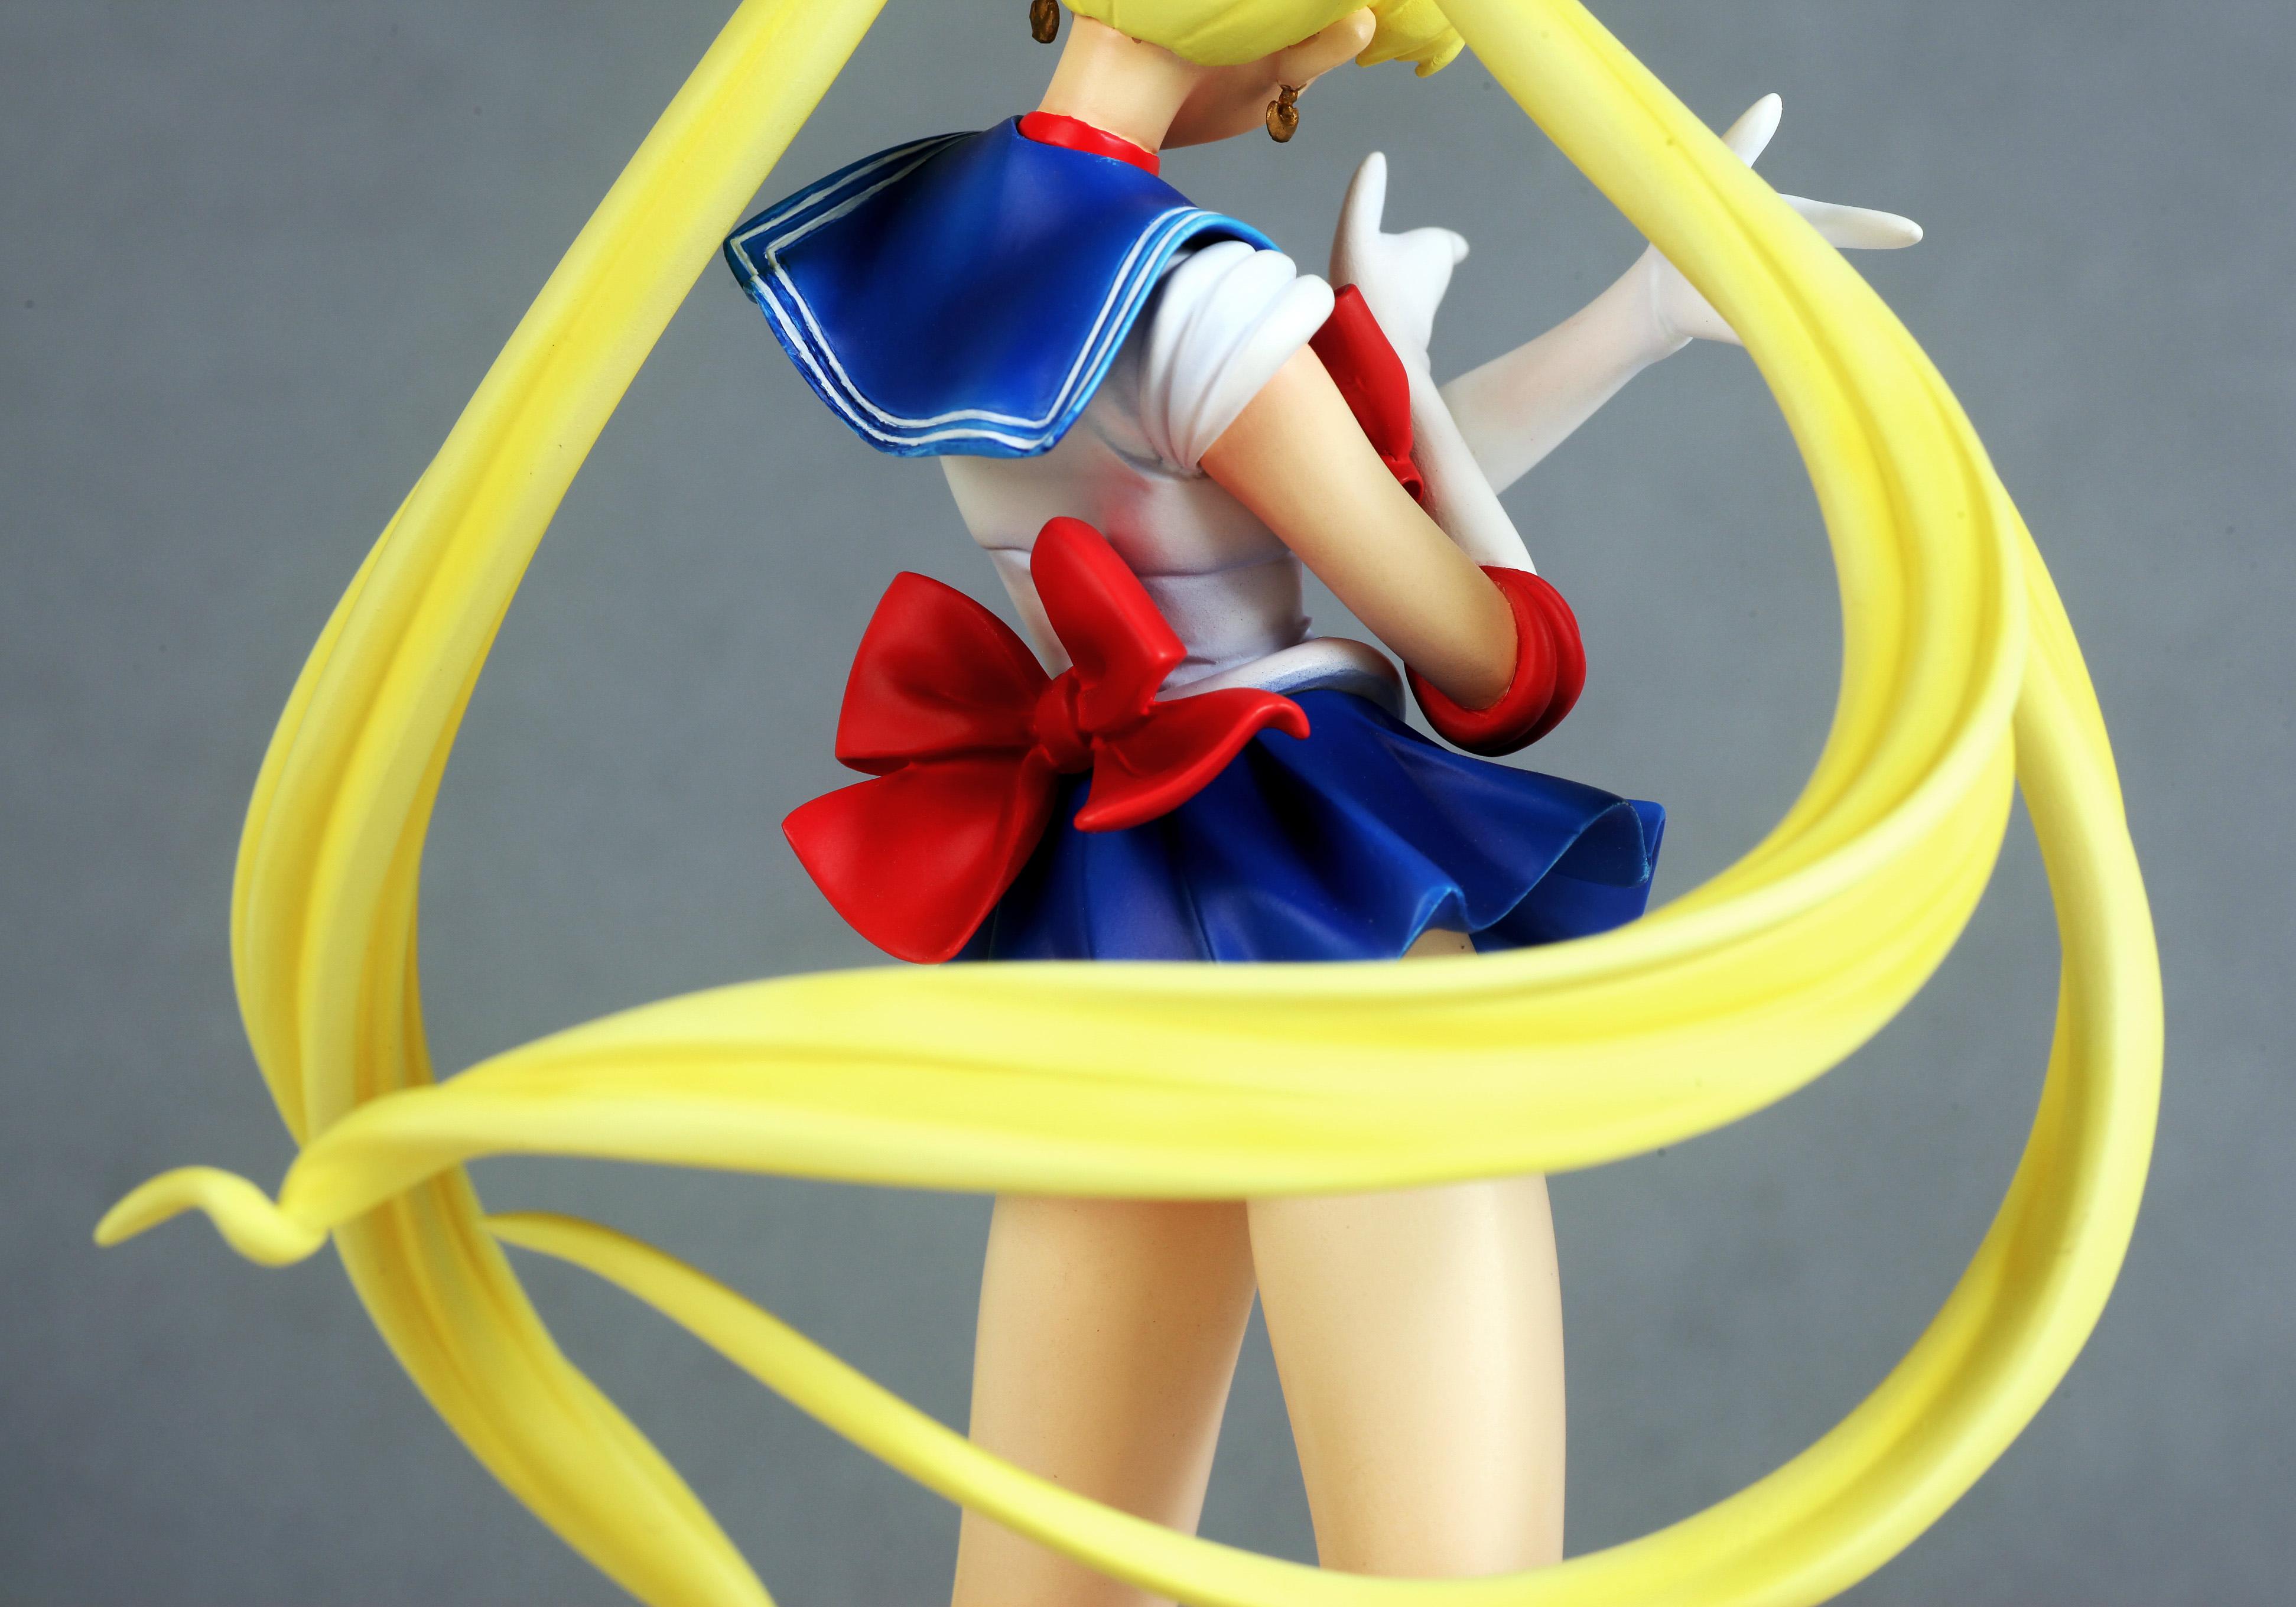 Sailor Moon Usagi Tsukino prepainted figure haruhichan.com Sailor Moon Anime figure 11